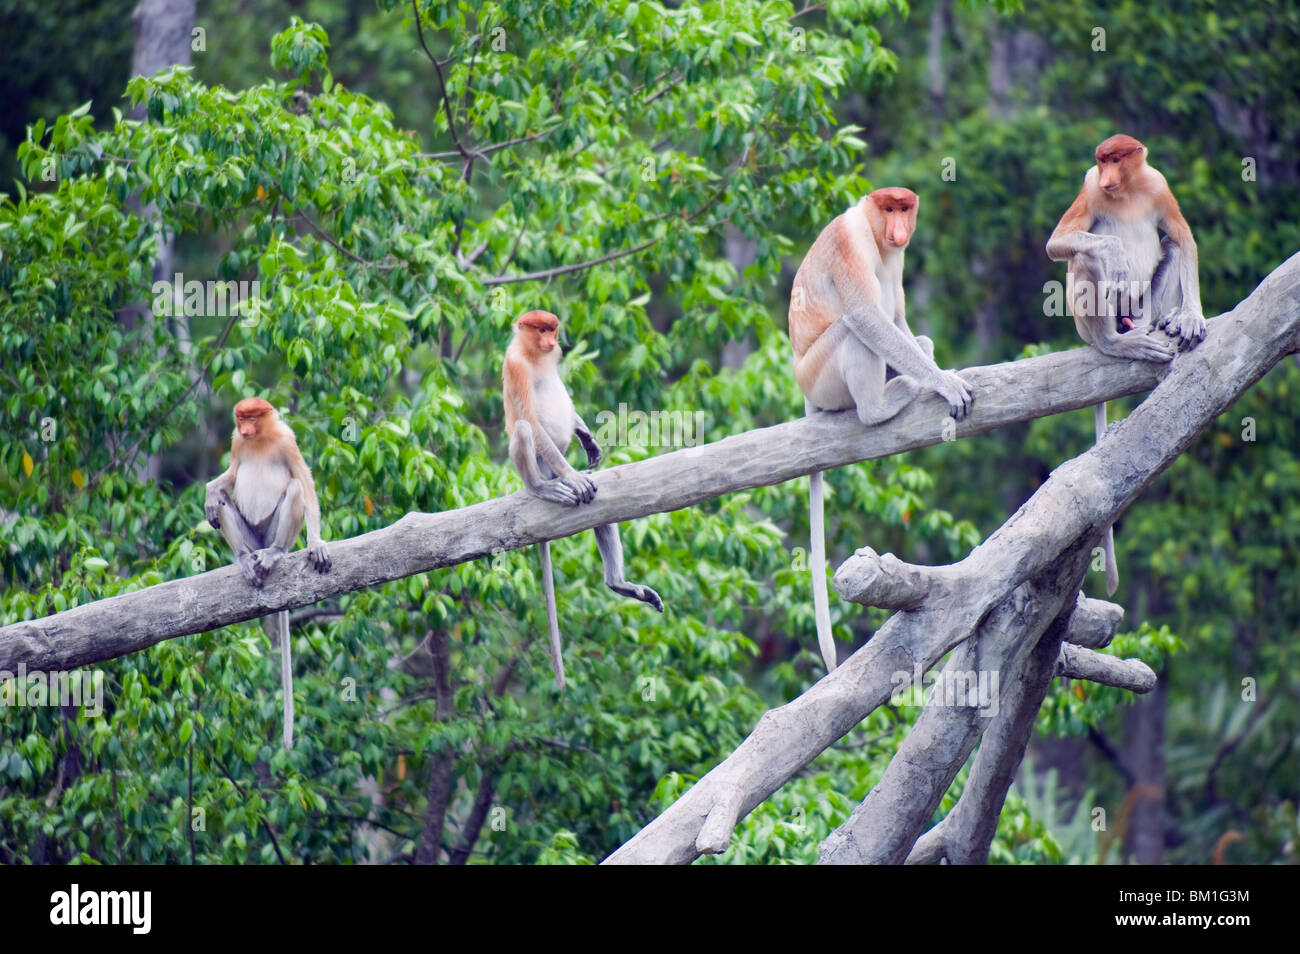 Labuk Bay Proboscis Proboscis Monkey, Monkey Sanctuary, Sabah, Bornéo, Malaisie, Asie du Sud, Asie Photo Stock